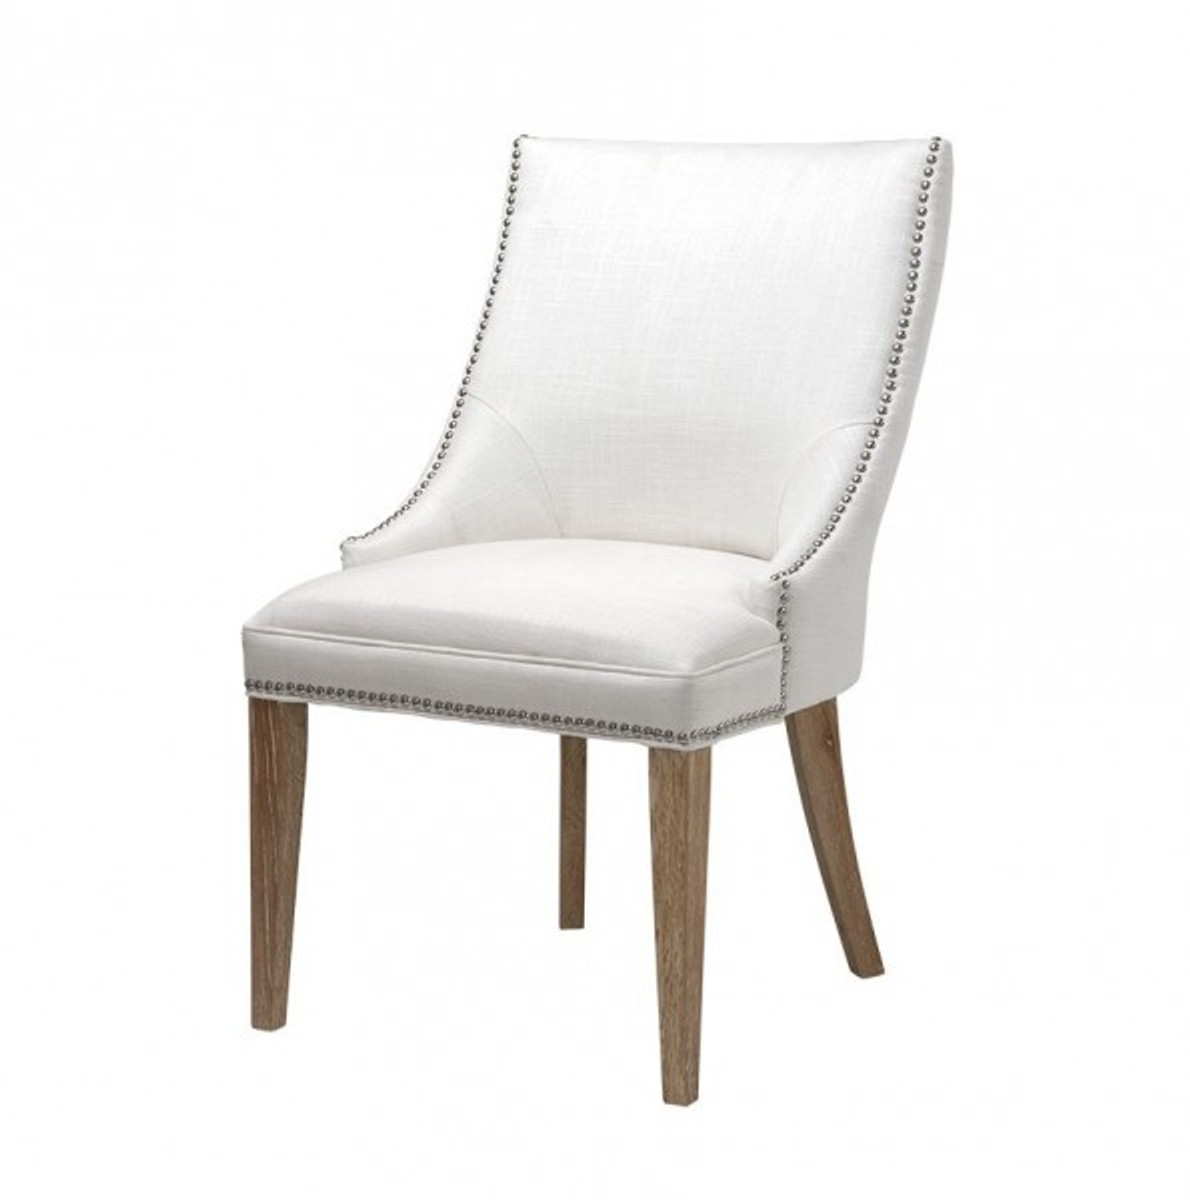 casa padrino luxus birkenholz esszimmer stuhl elfenbein luxus hotel m bel st hle luxus st hle. Black Bedroom Furniture Sets. Home Design Ideas